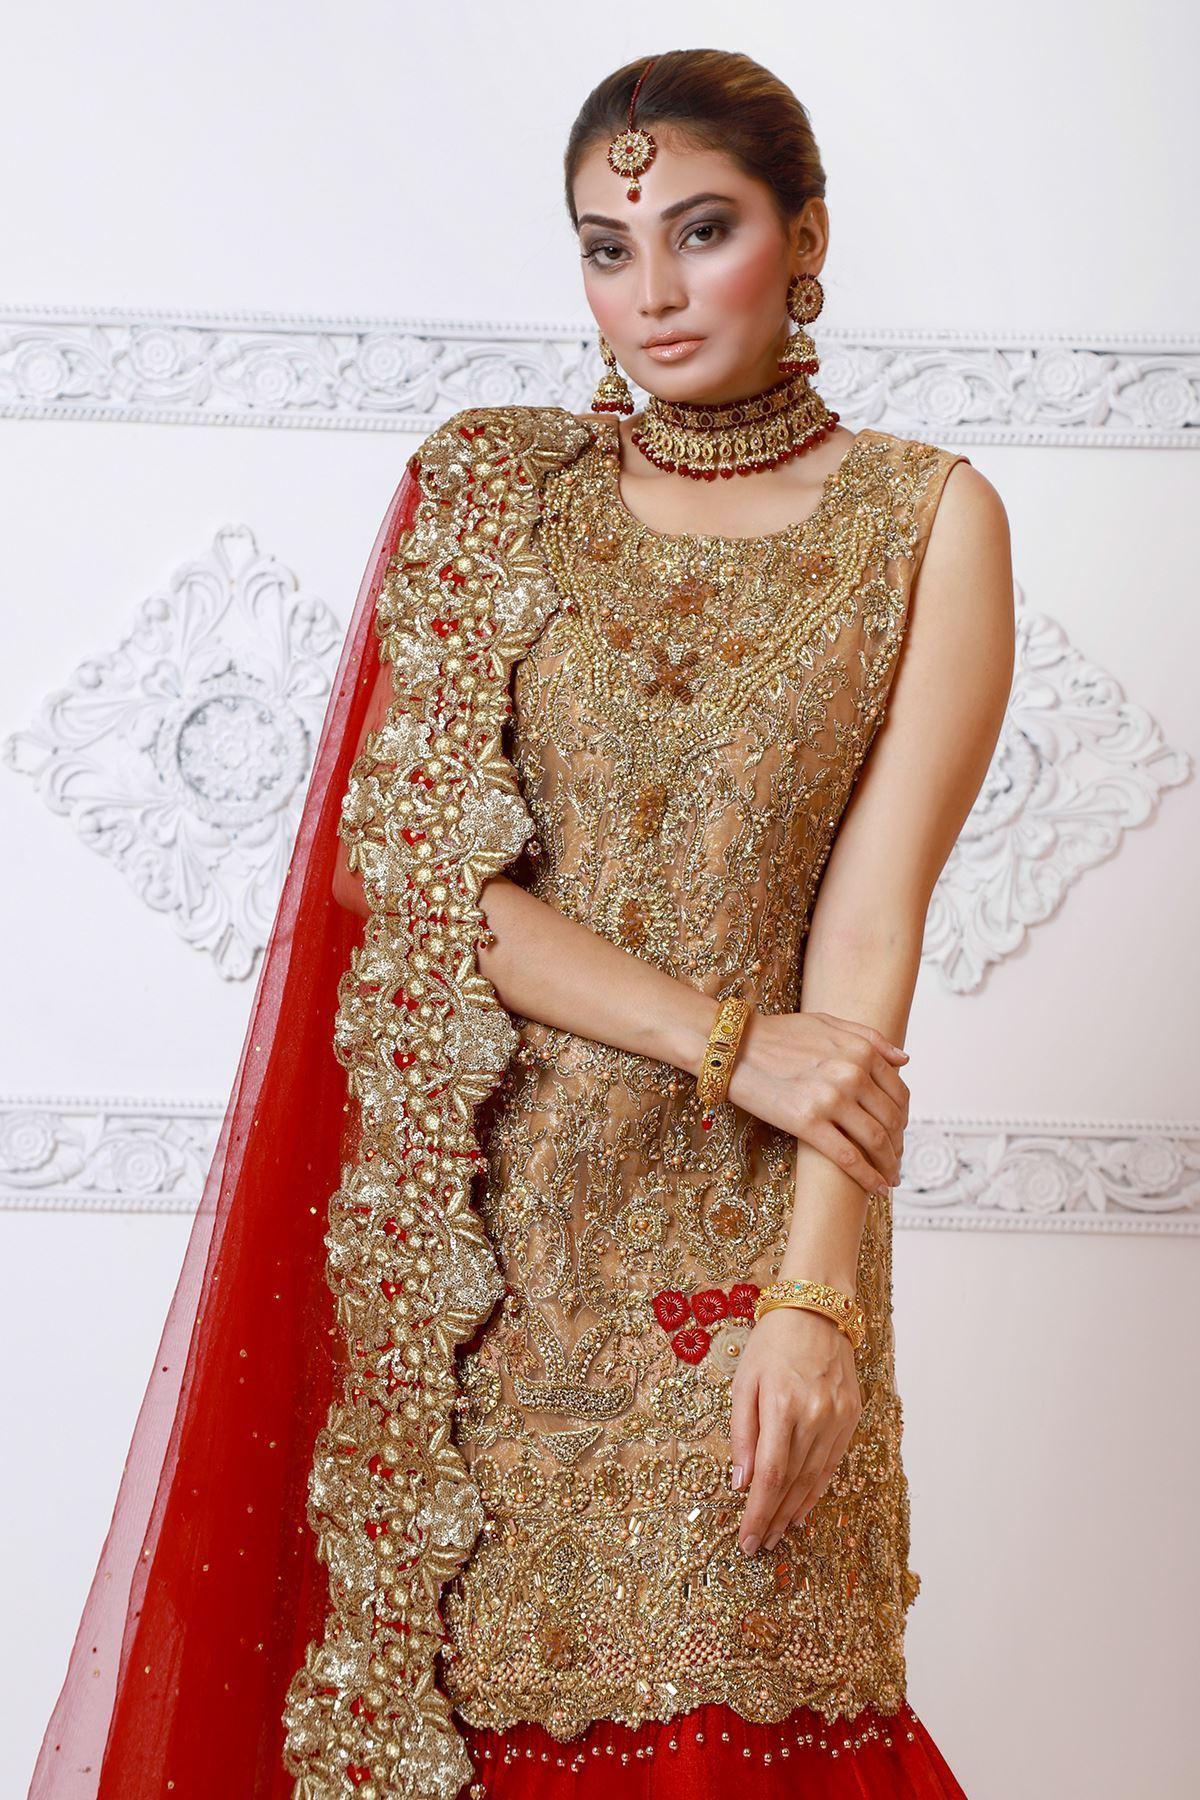 Moazzam Khan Party Wear 3PC Shirt Sharara Dupatta in Fawn for Women